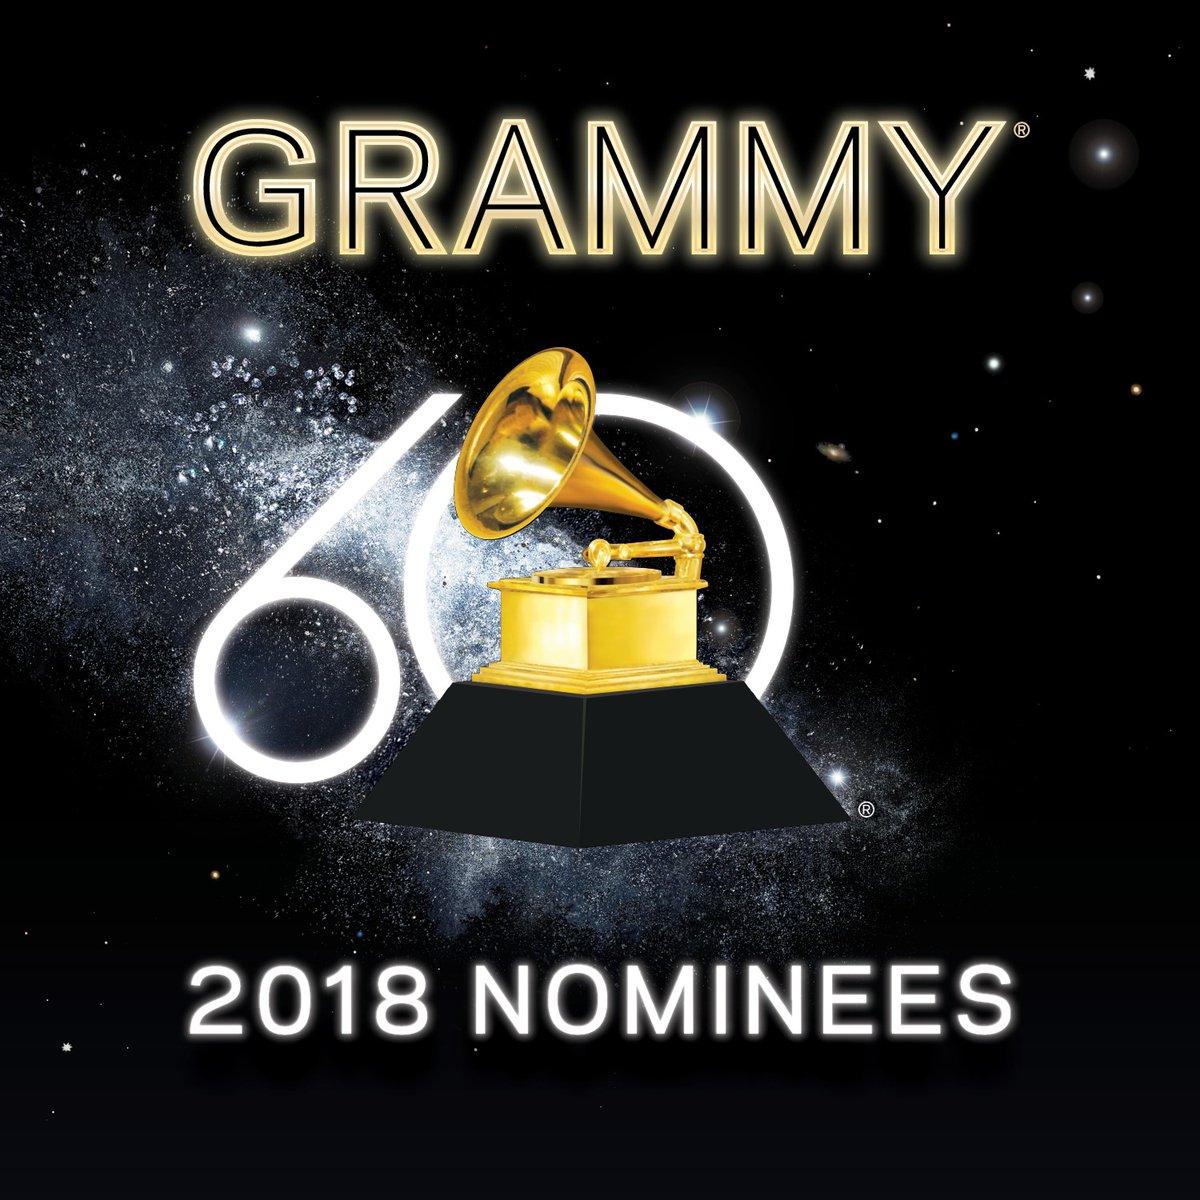 Nominados al Grammy 2018. Foto: Grammy 2018/Twitter @RecordingAcad